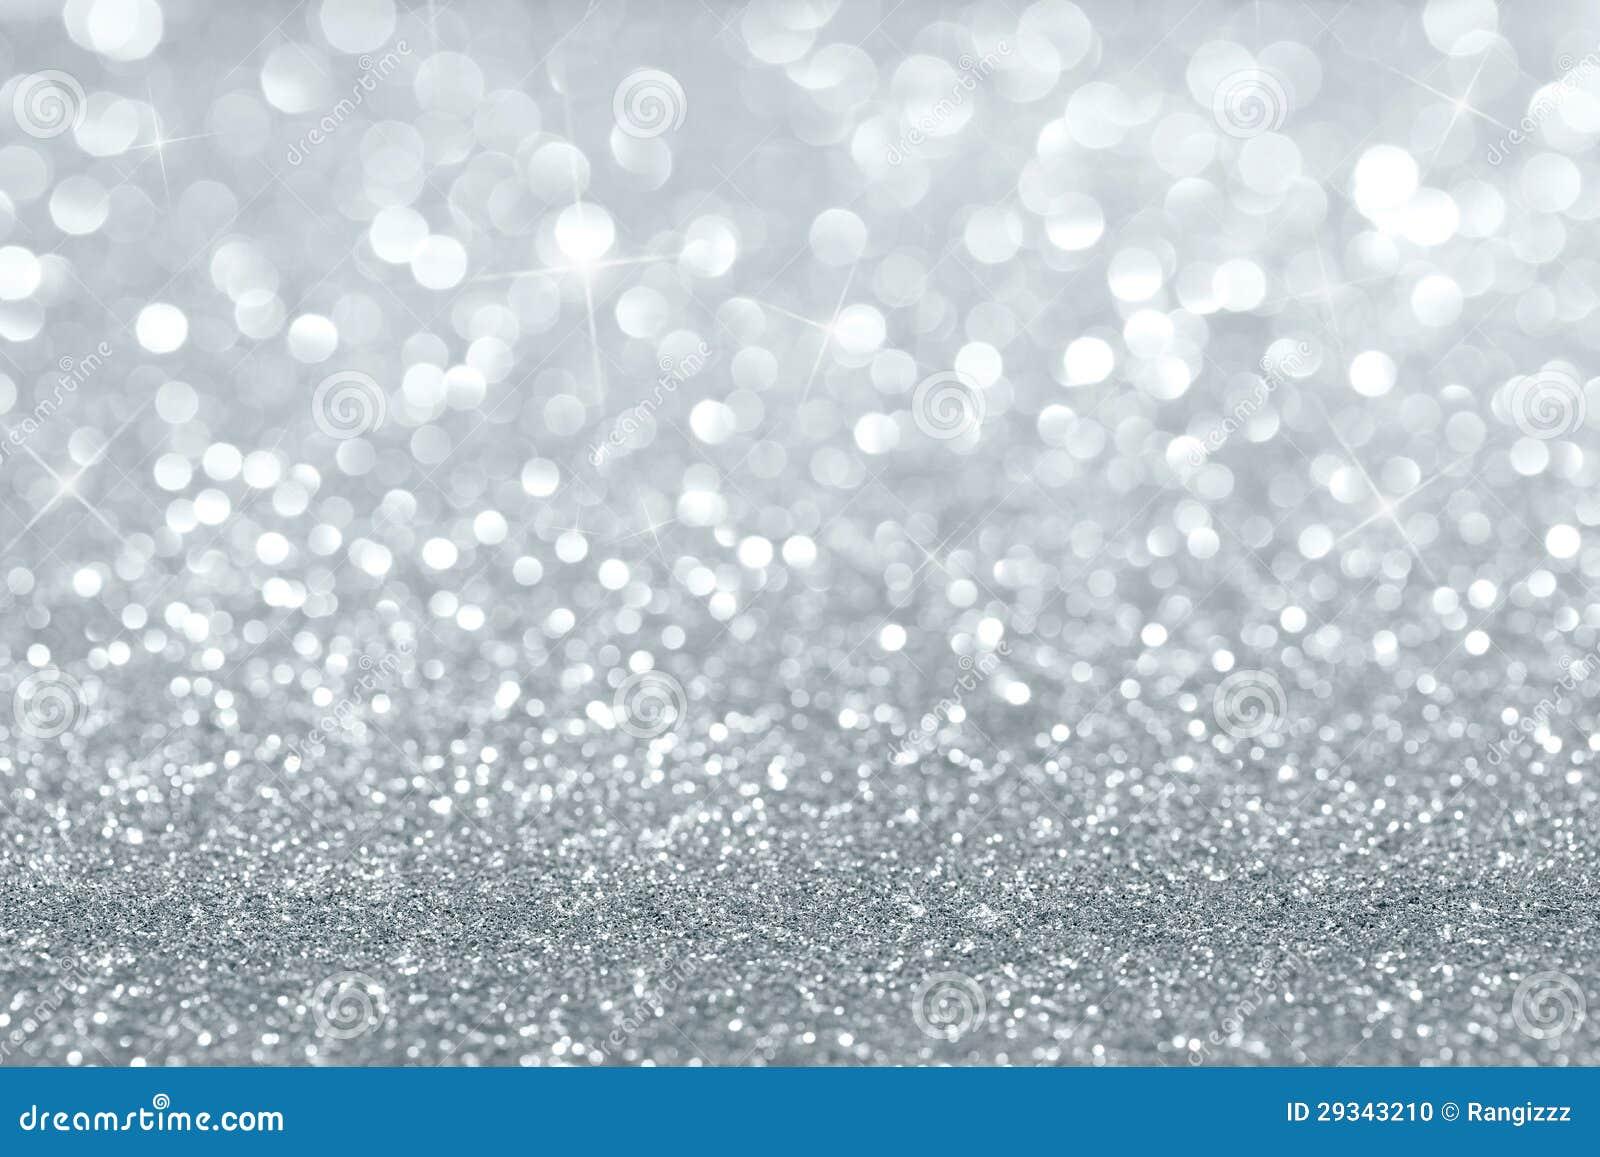 Fondo d argento di scintillio